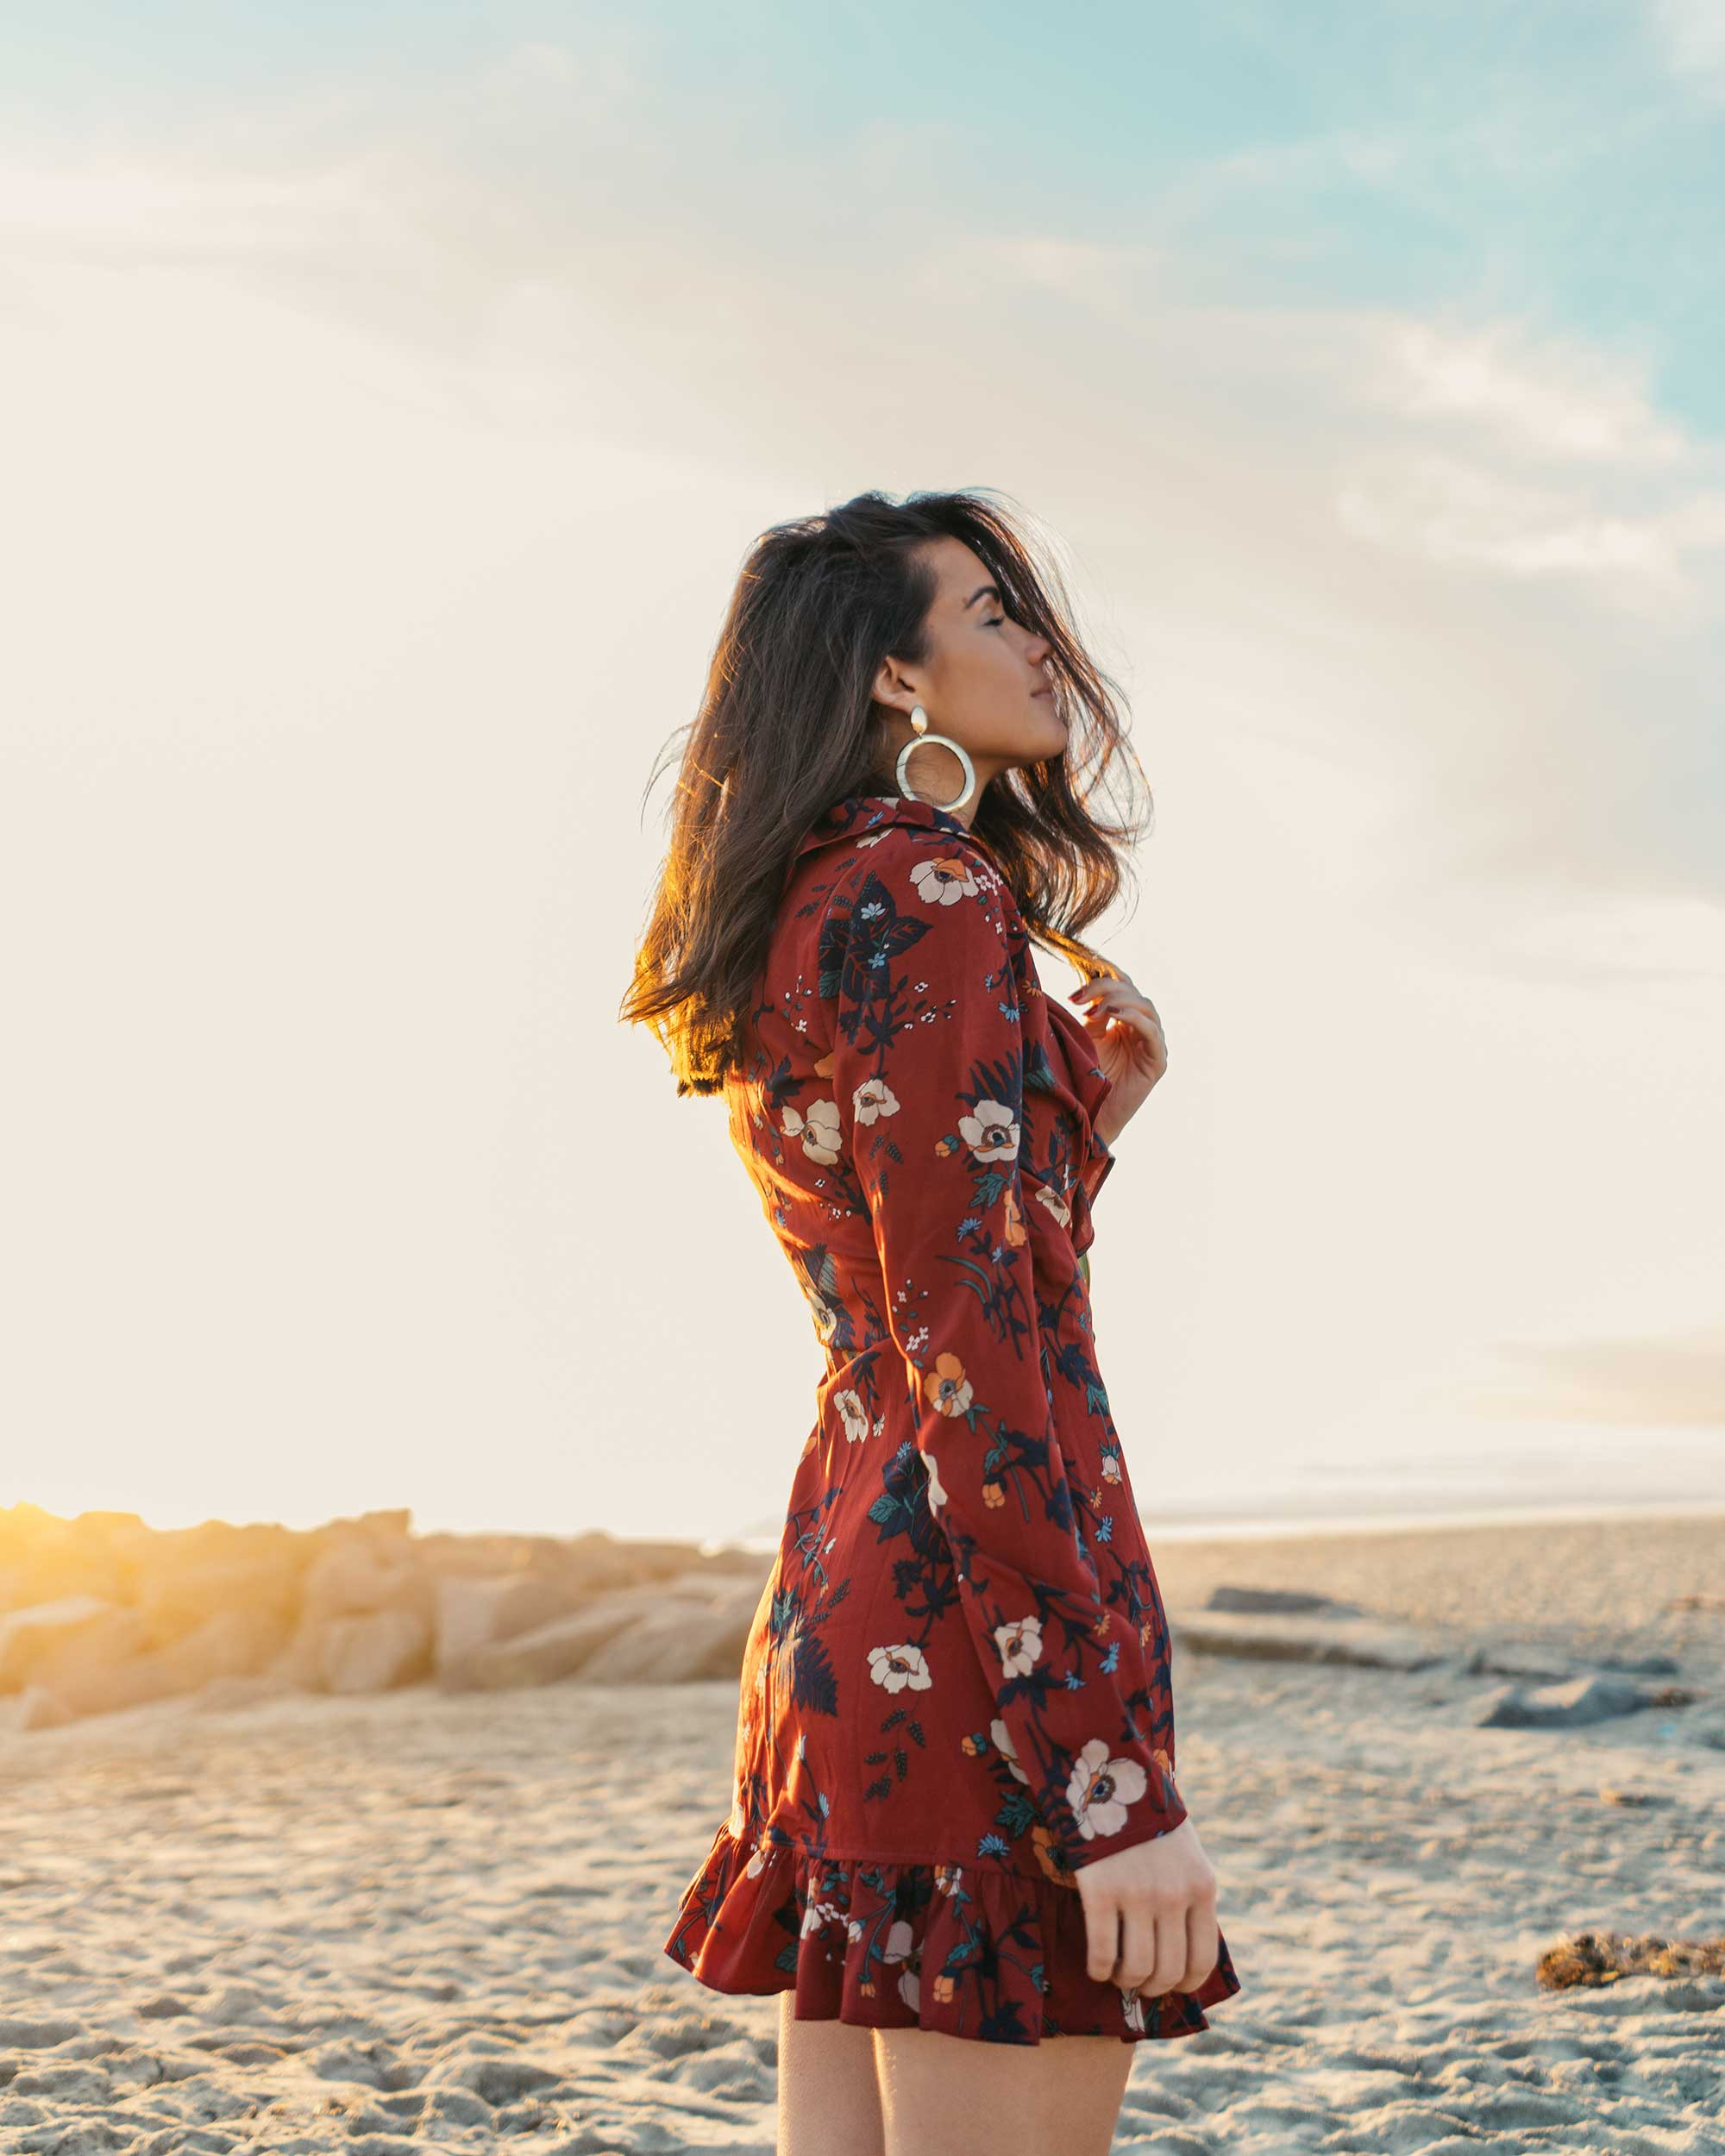 BURGUNDY-FLORAL-FRILL-WRAP-MINI-DRESS-Newport-Beach-California-Summer-Dress-2.jpg